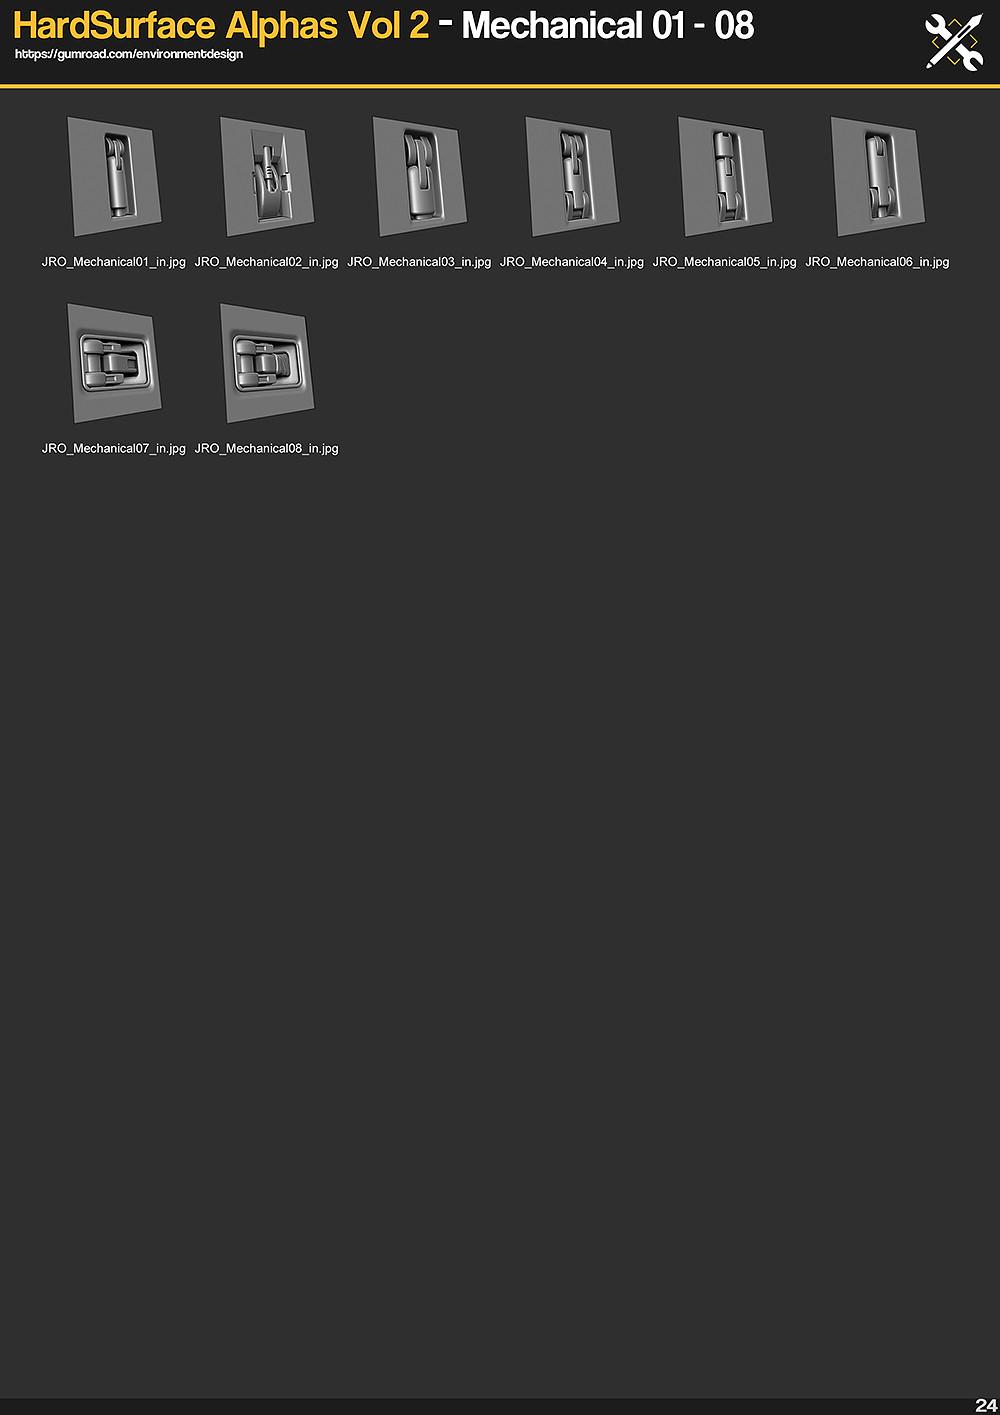 JRO Store - https://gumroad.com/environmentdesign